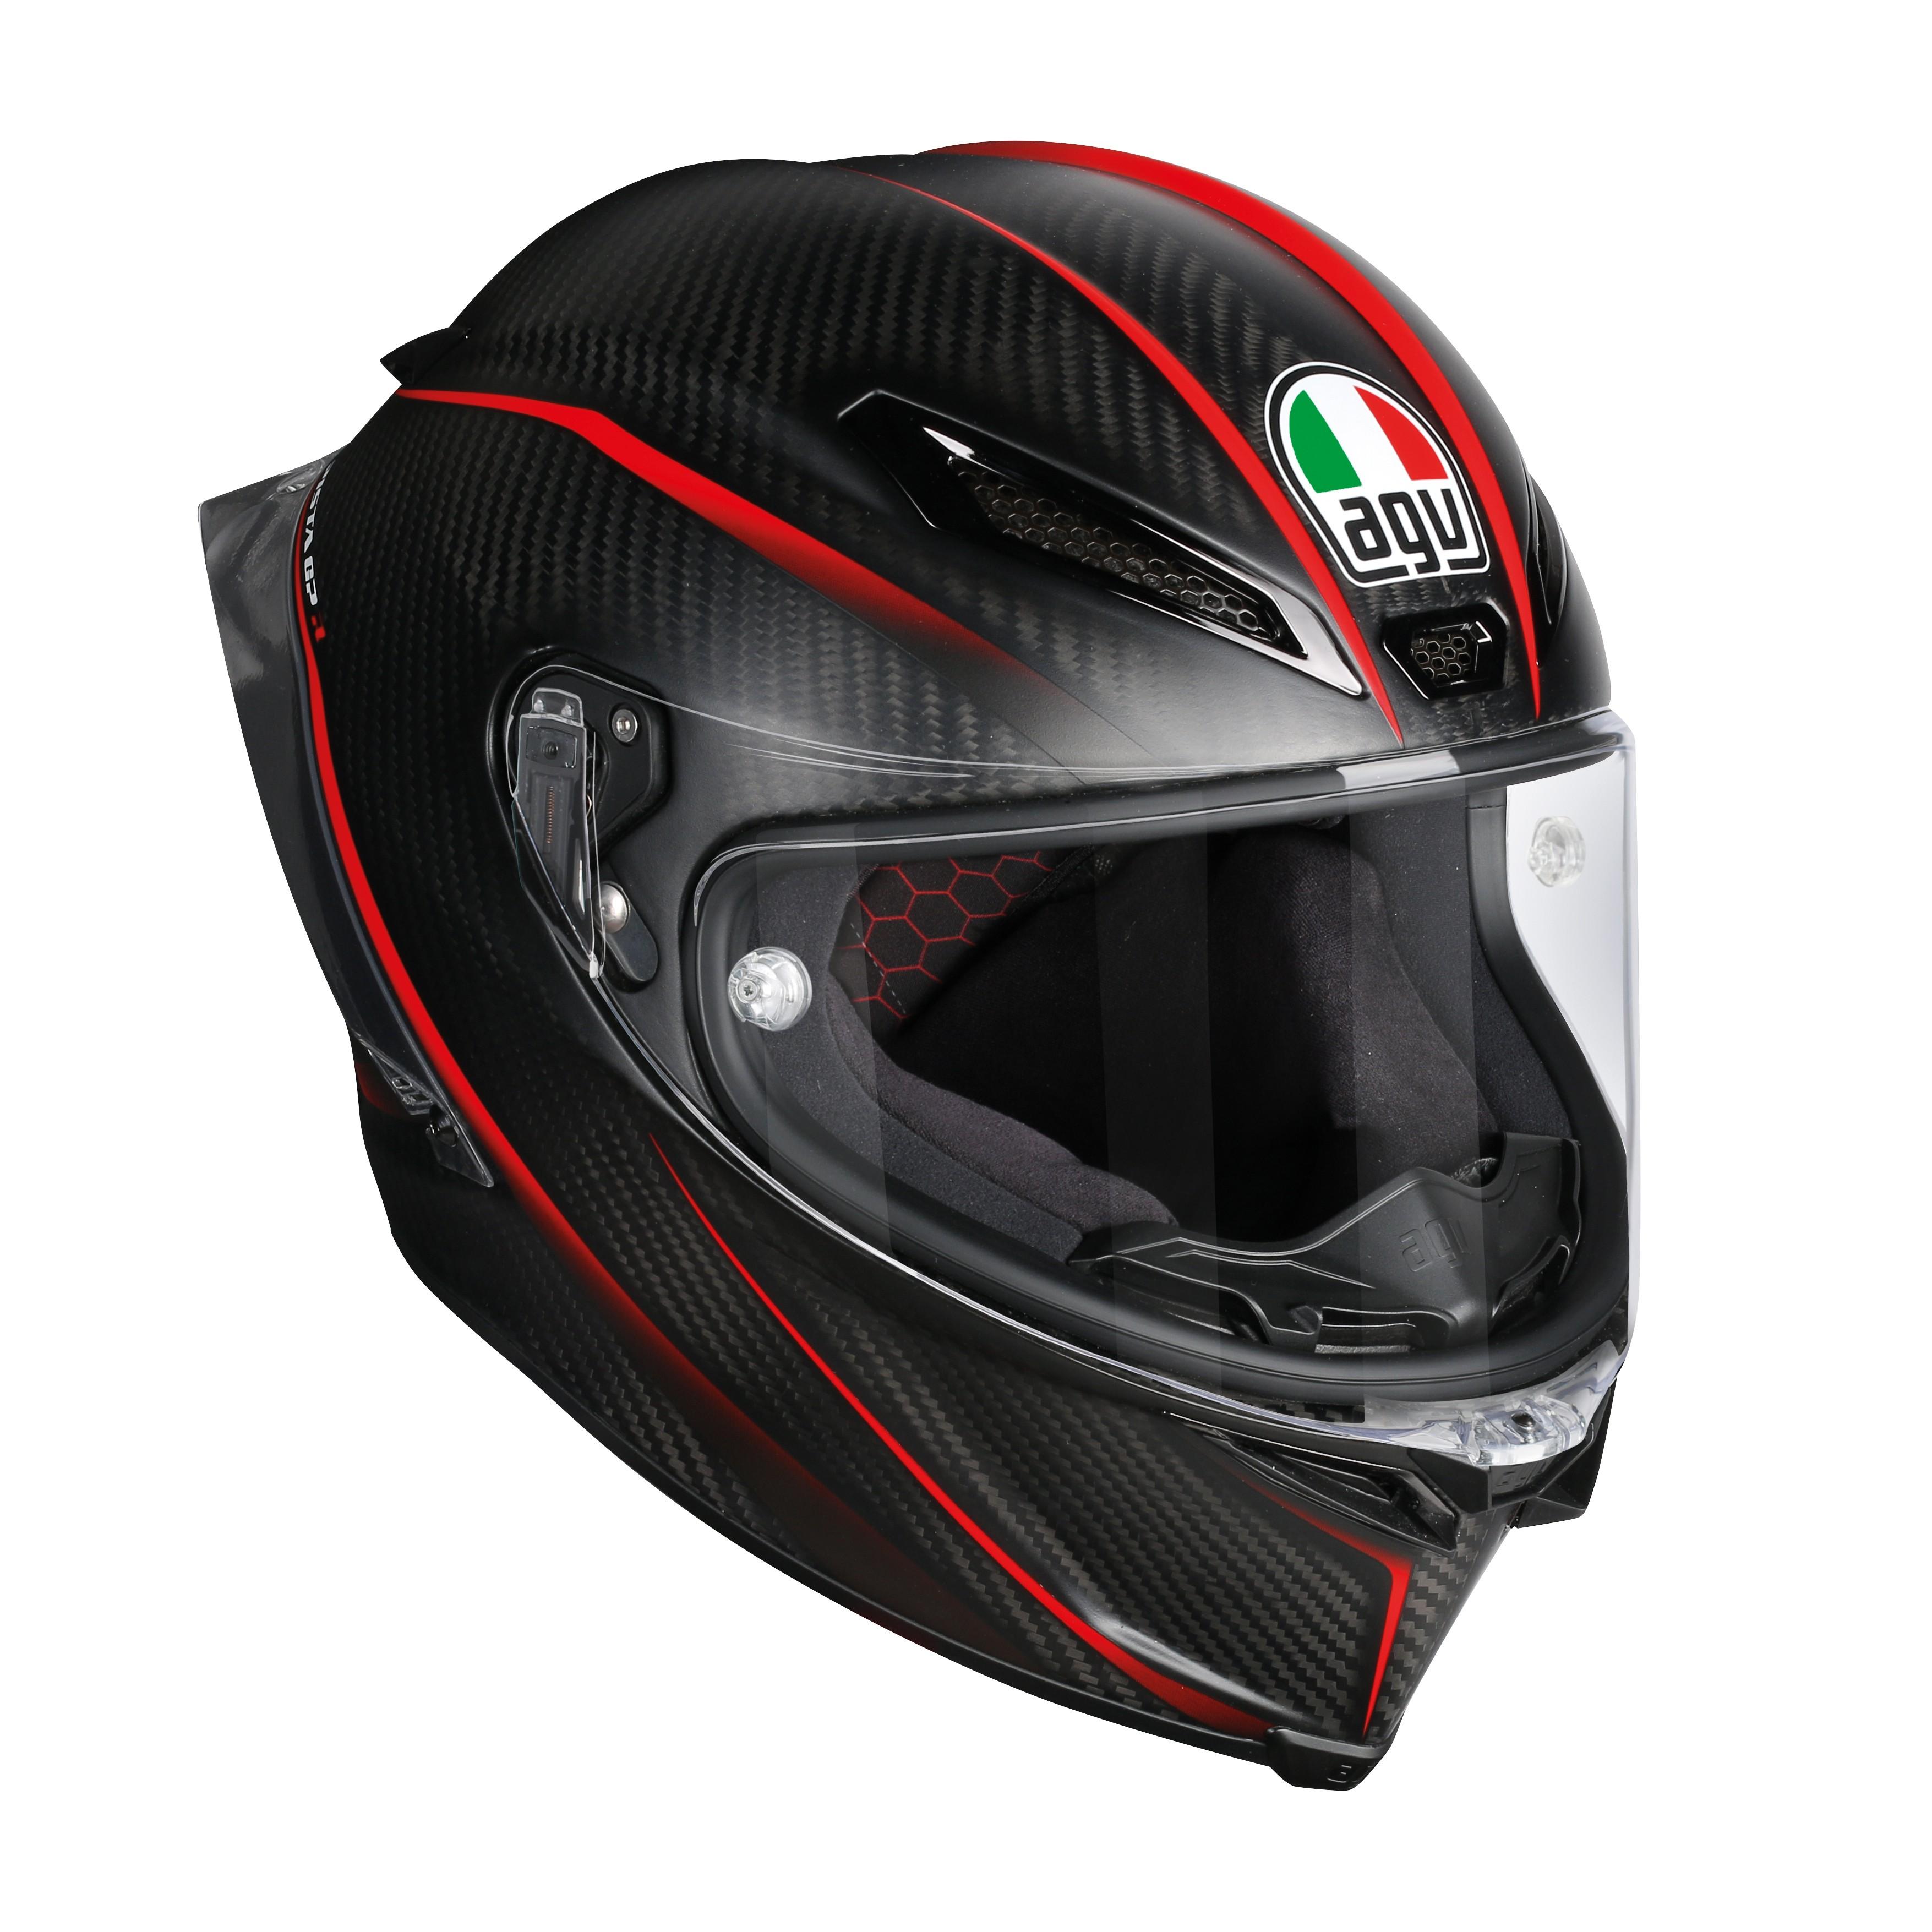 Agv Pista Gp R Gran Premio Full Face Track Helmet